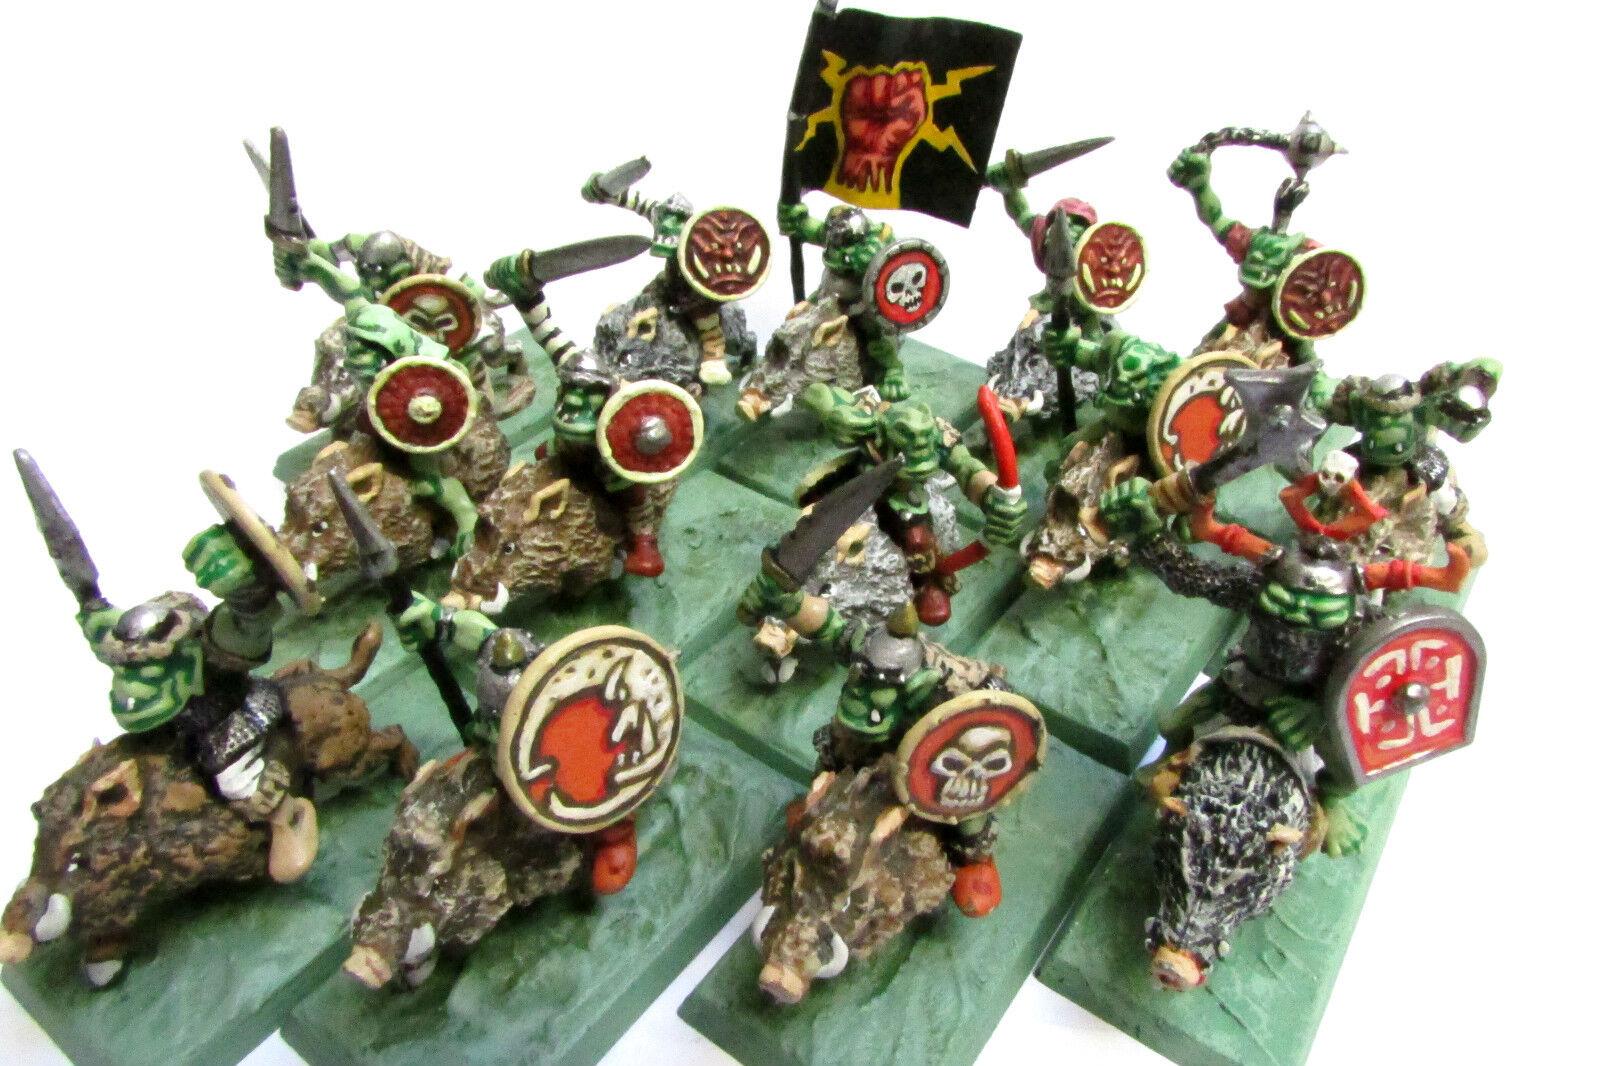 OOP Citadel   Warhammer   Marauder Miniatures Chaos Chaos Chaos MM22 4 Orc Boar Riders 0747f6